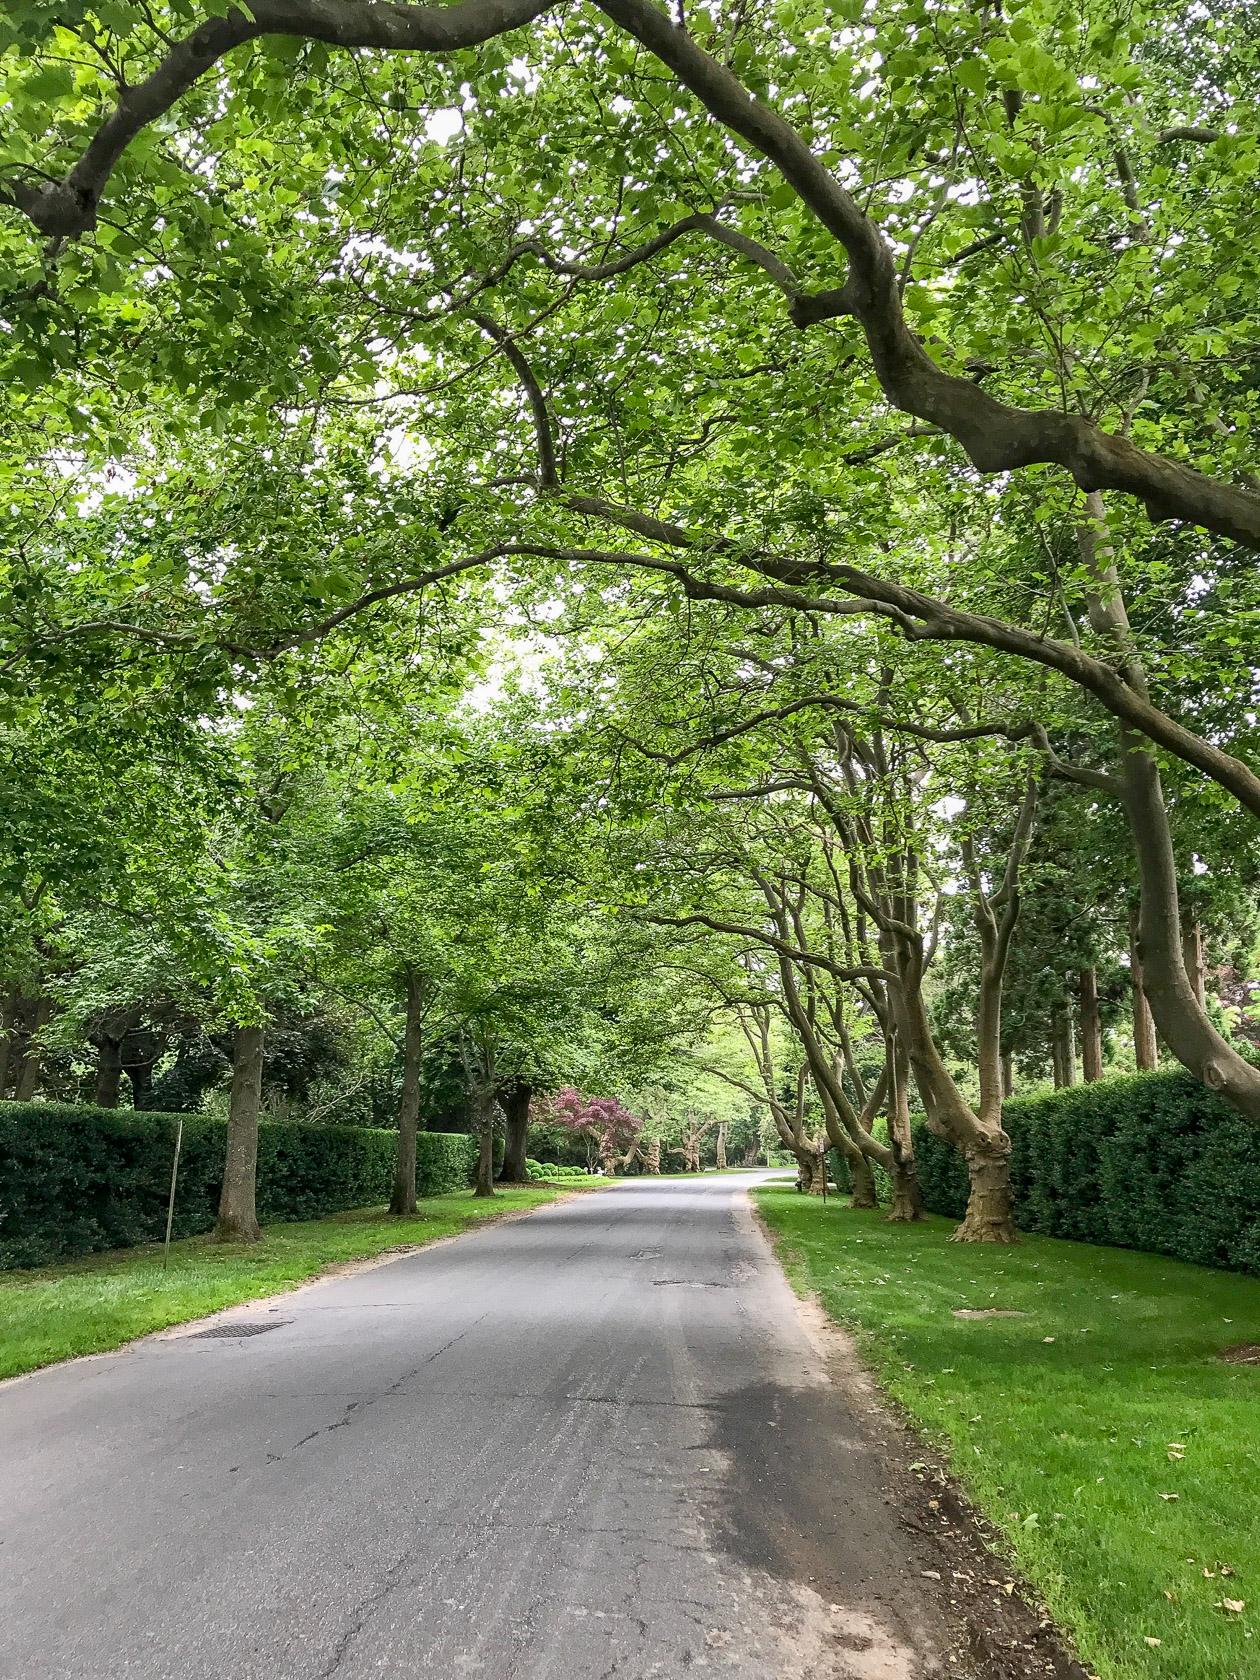 Tree lined street of my dreams!